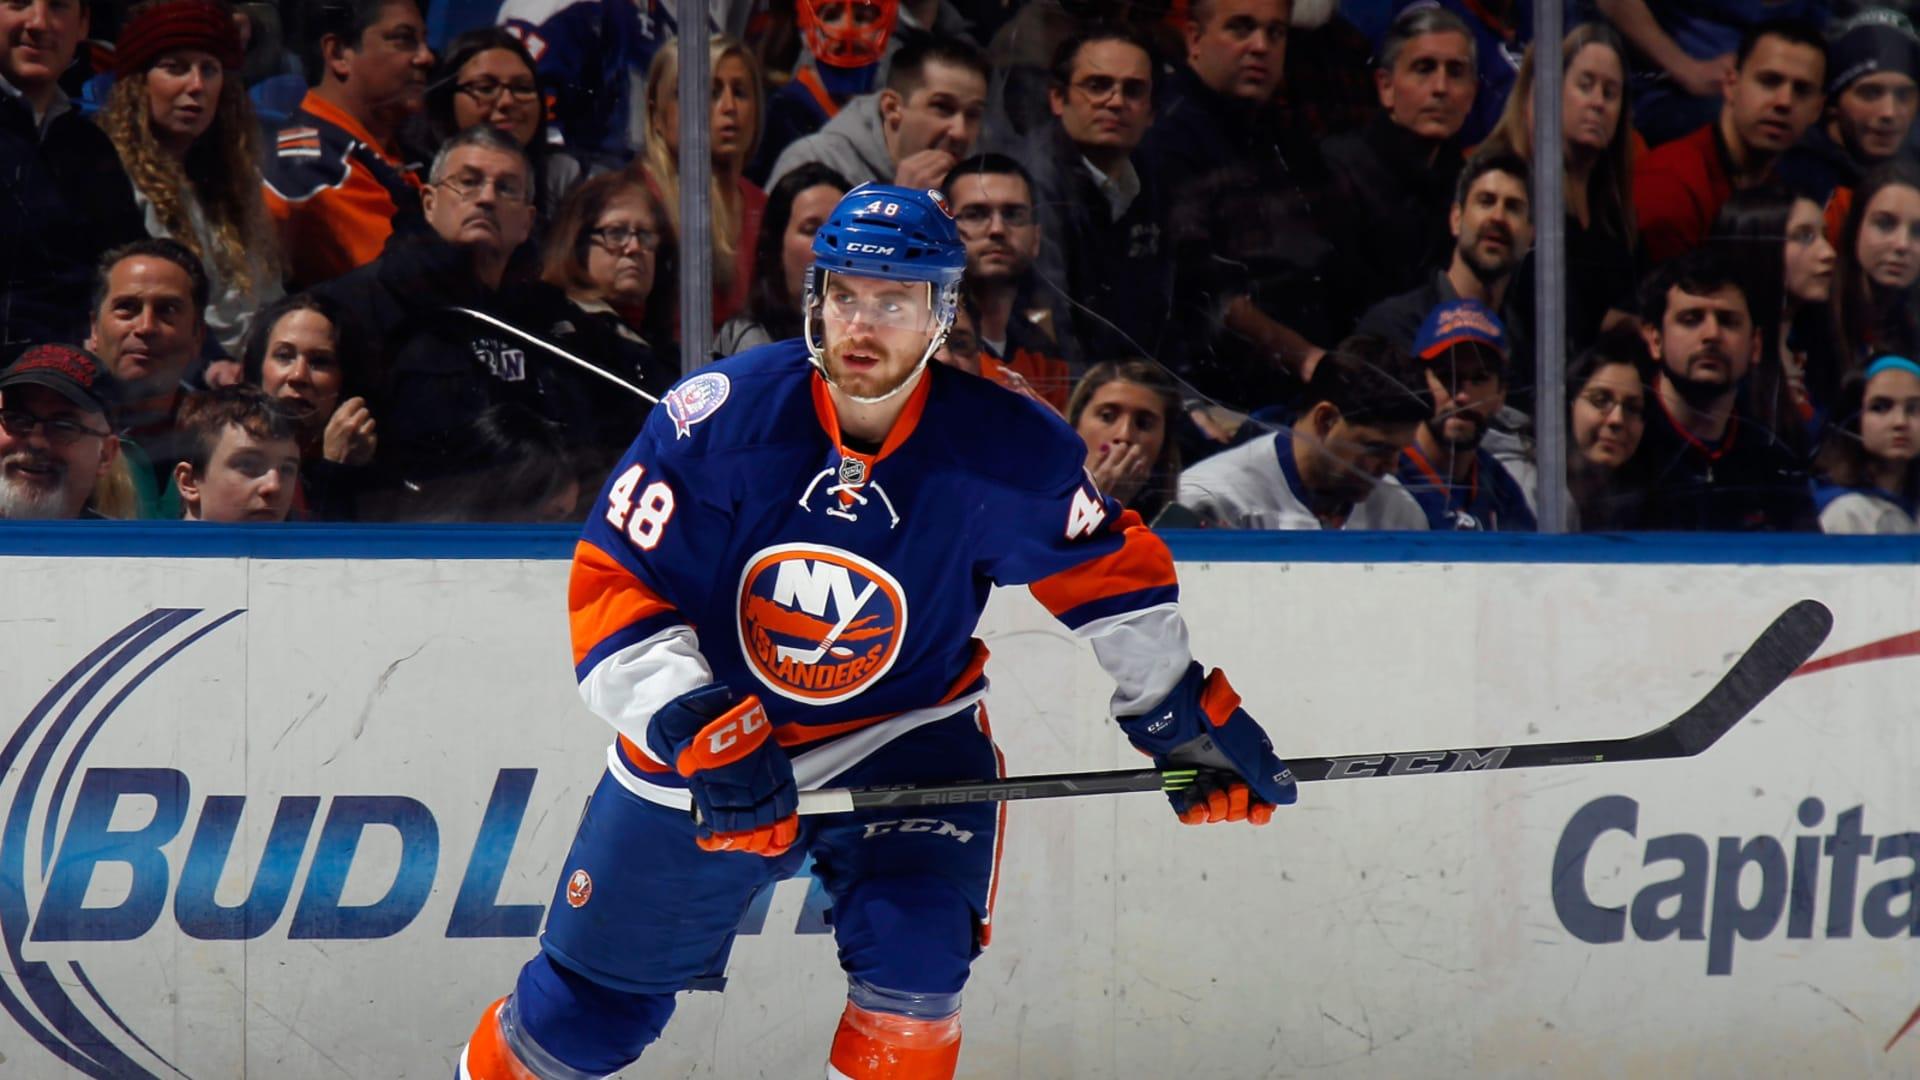 Islanders: Best Player To Wear Number 48